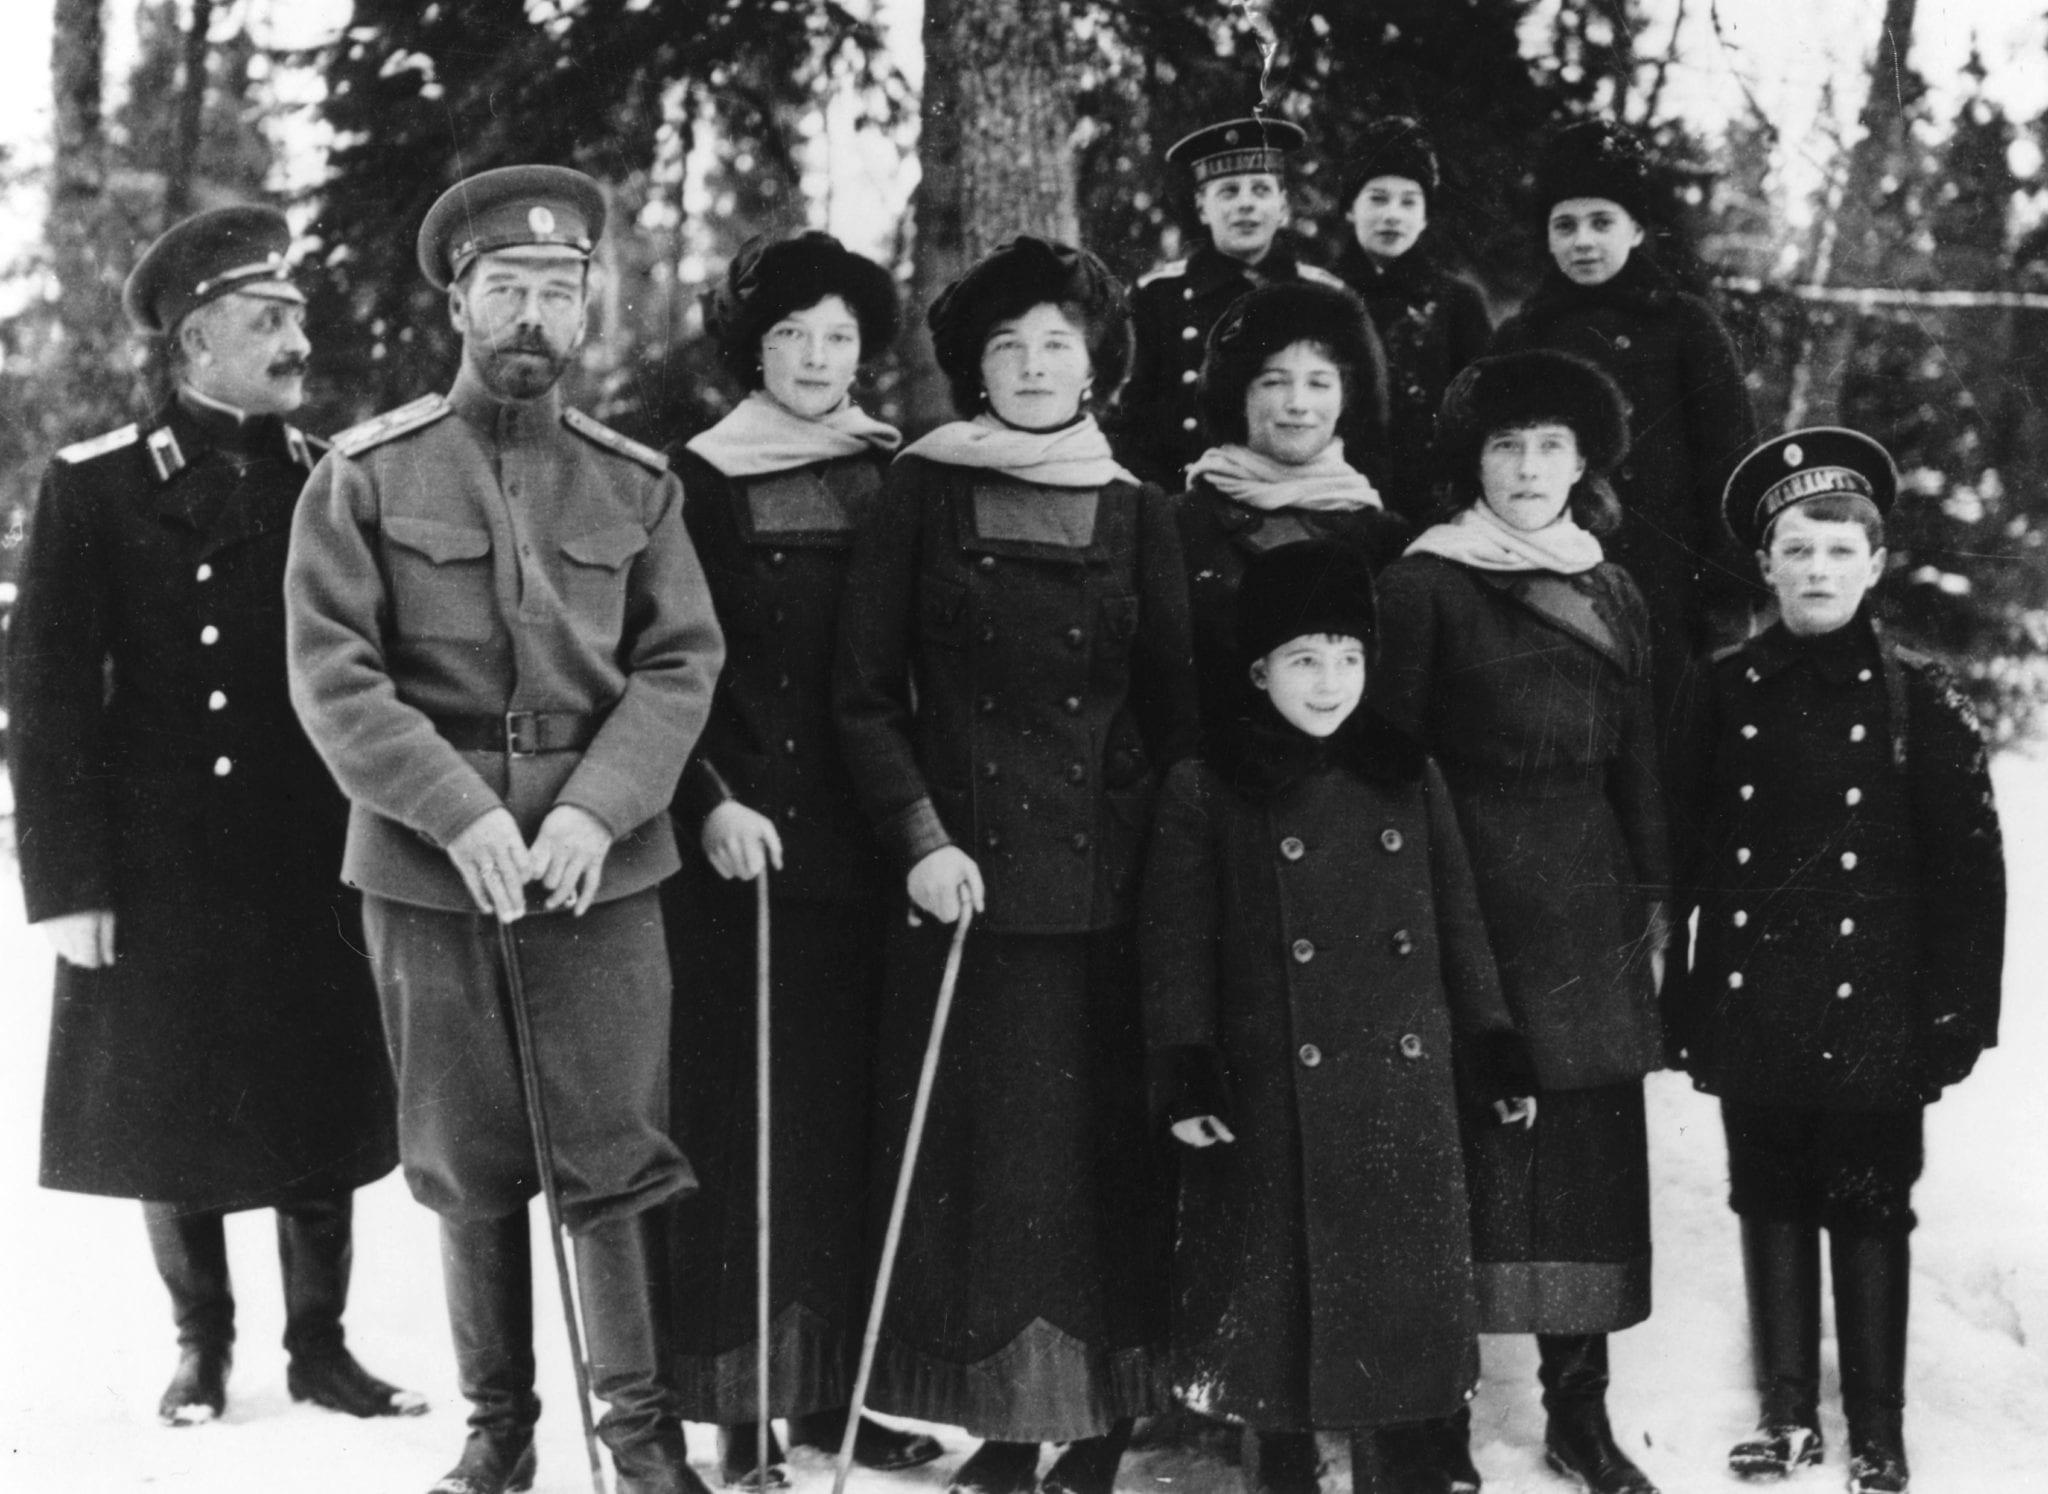 Nicholas II romanovs Ekaterinburg Tsarskoye Selo